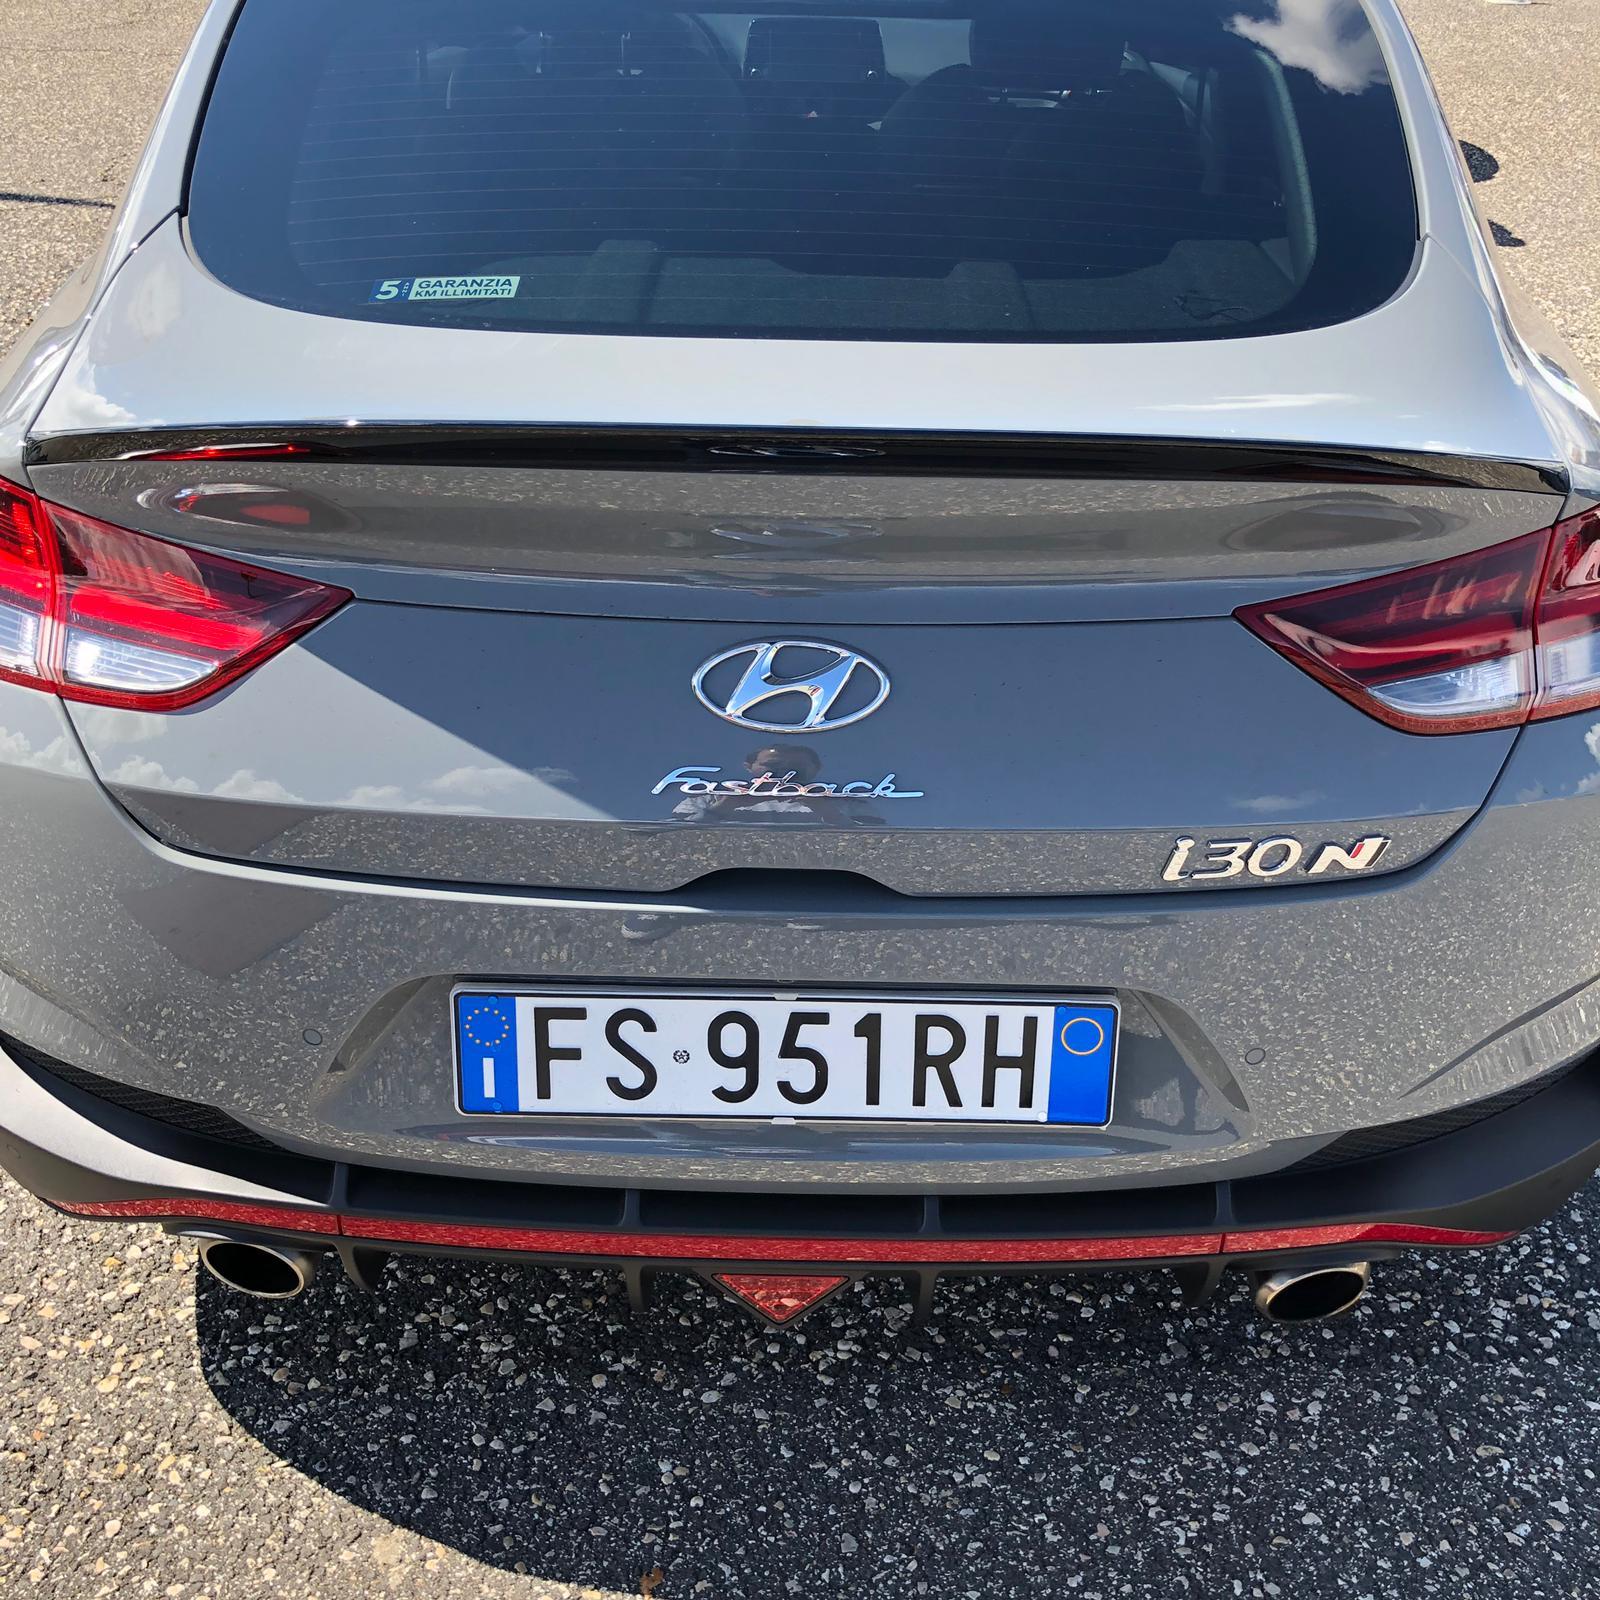 posteriore-hyundai-i30n-fastback-fleet-motor-day-2019